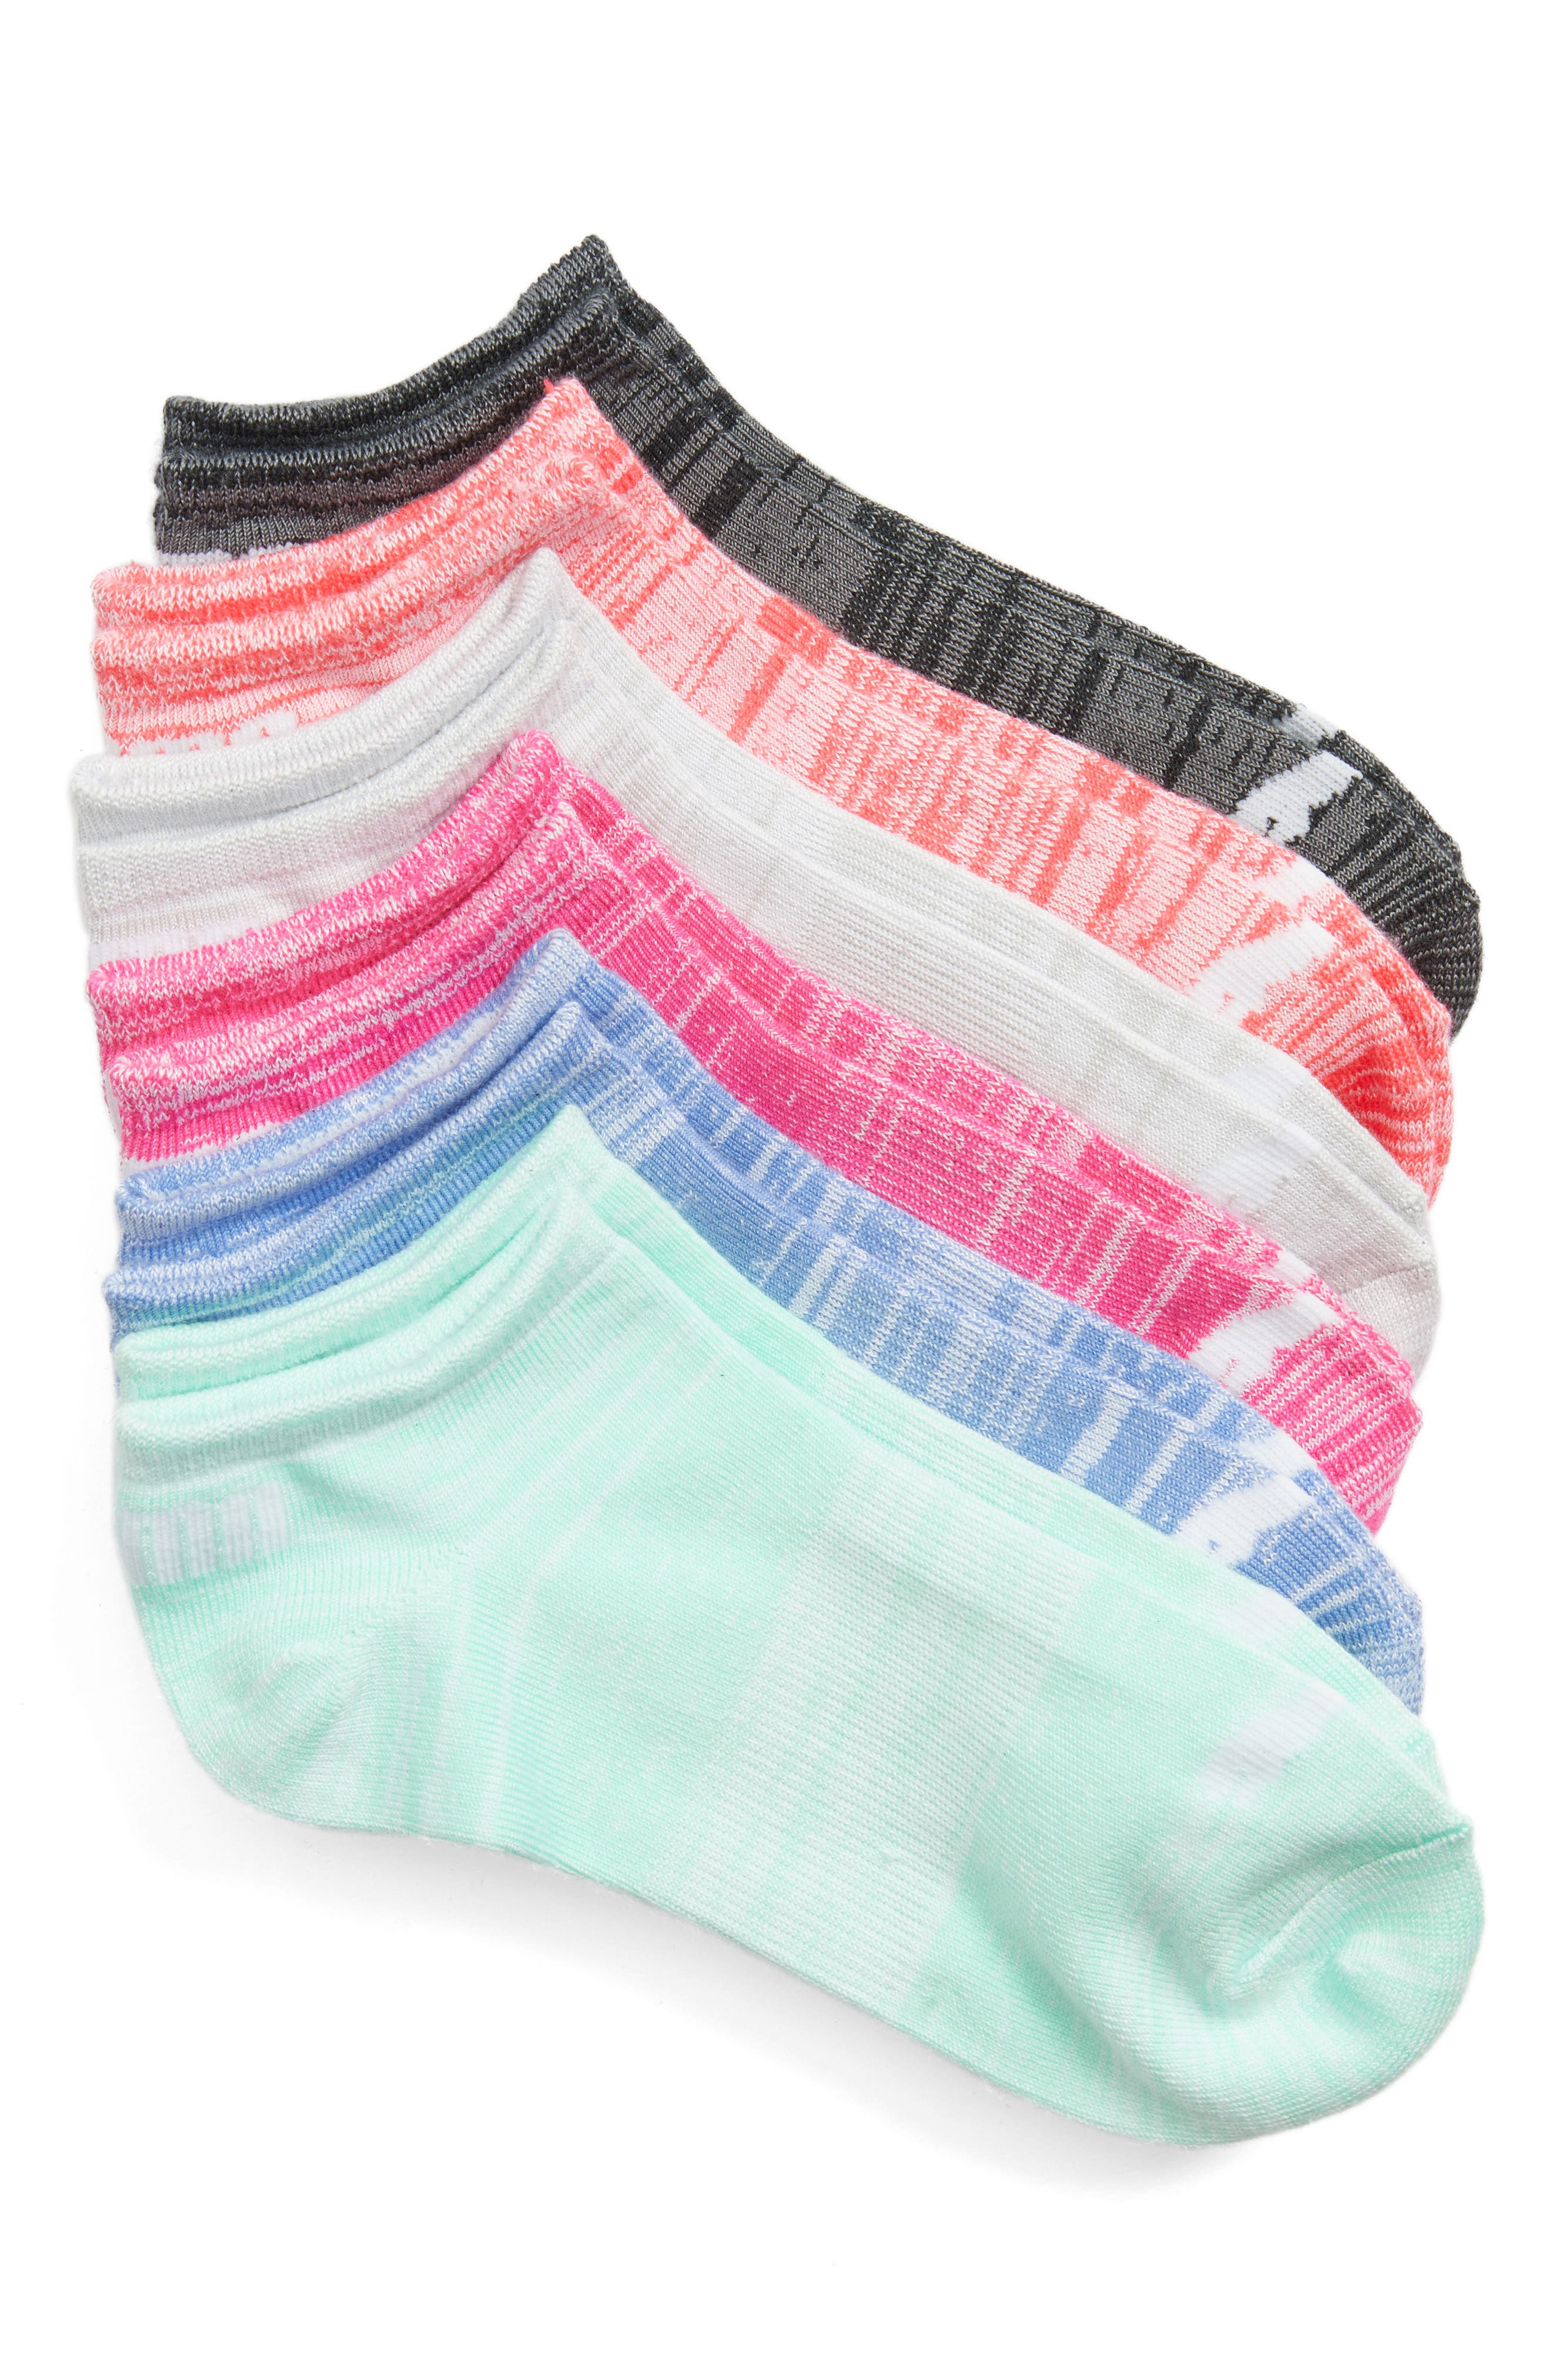 Alternate Image 1 Selected - Puma 6-Pack No-Show Socks